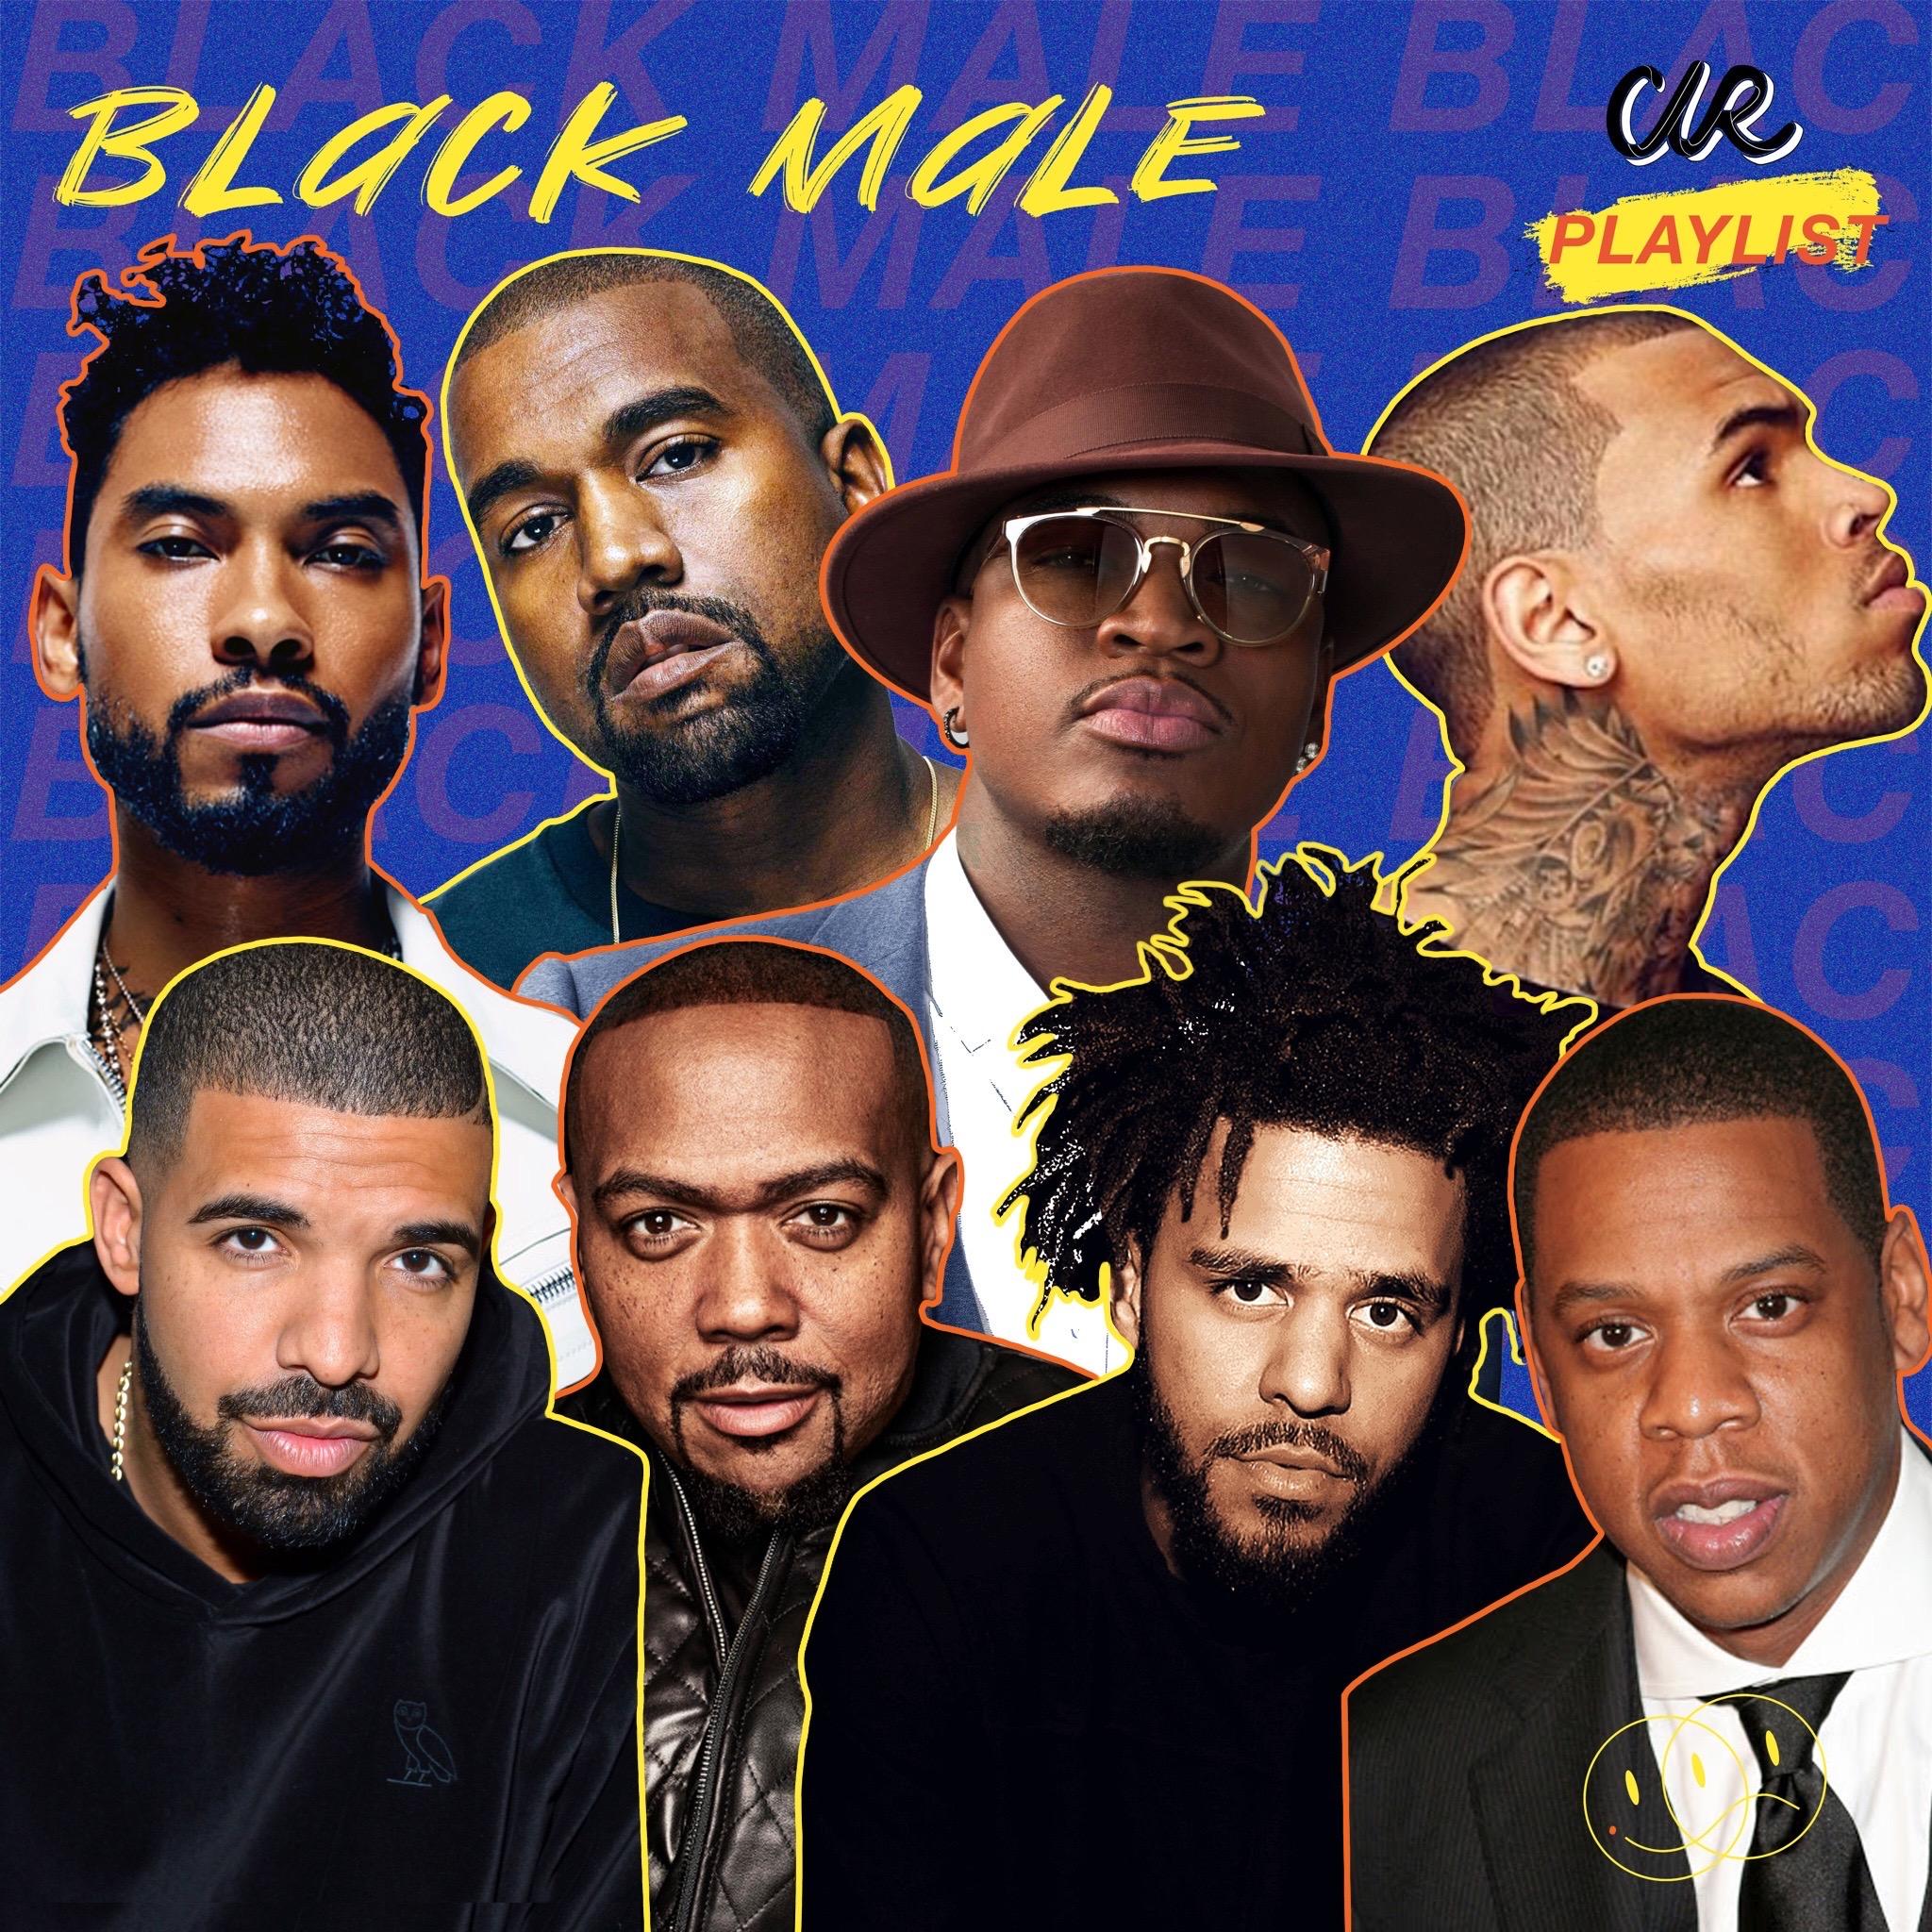 BLACK MALE Playlist